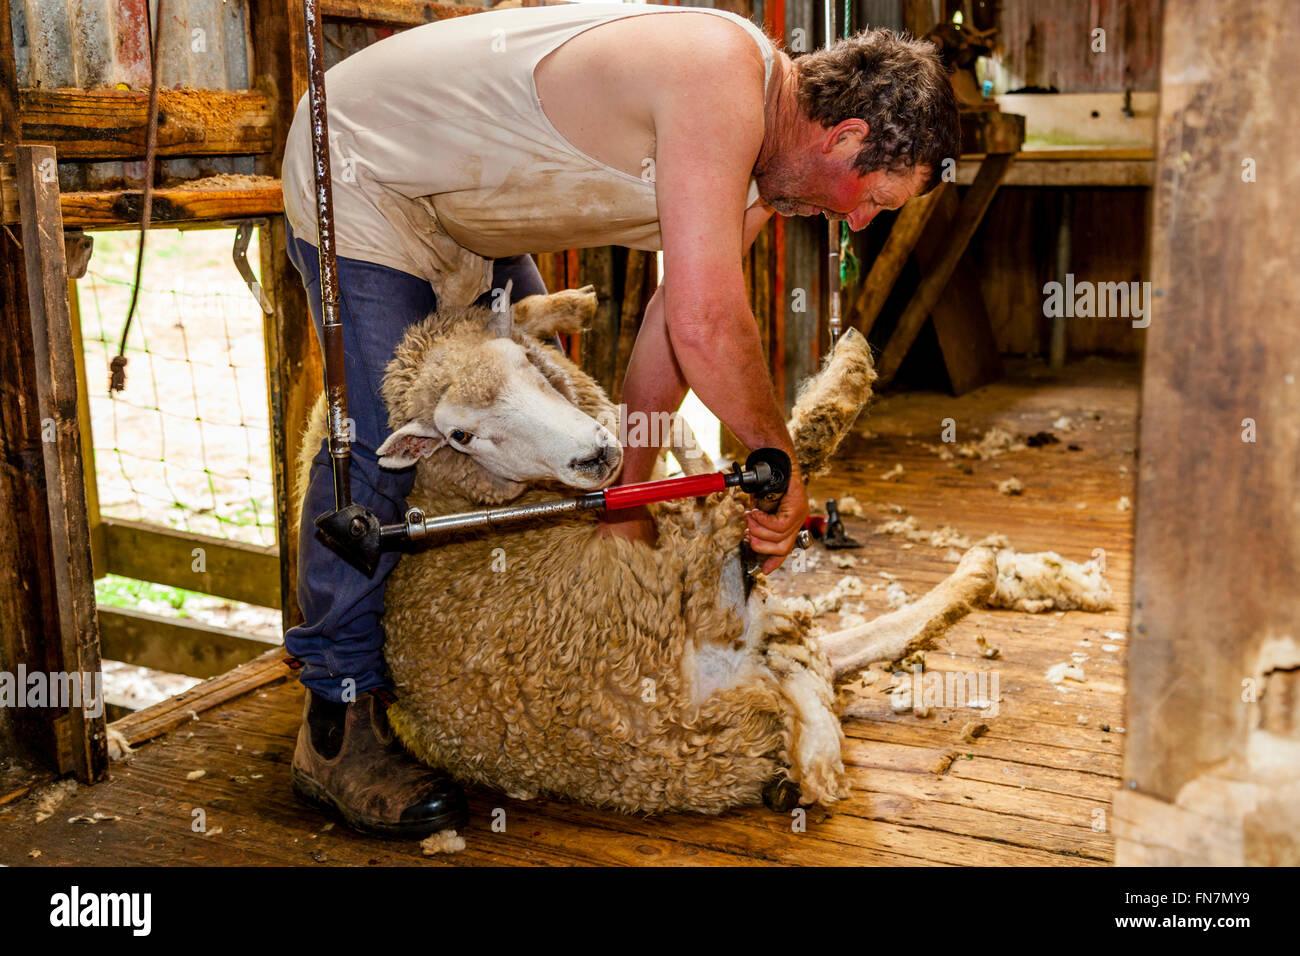 Sheep Crotching At A Sheep Farm, Pukekohe, New Zealand - Stock Image